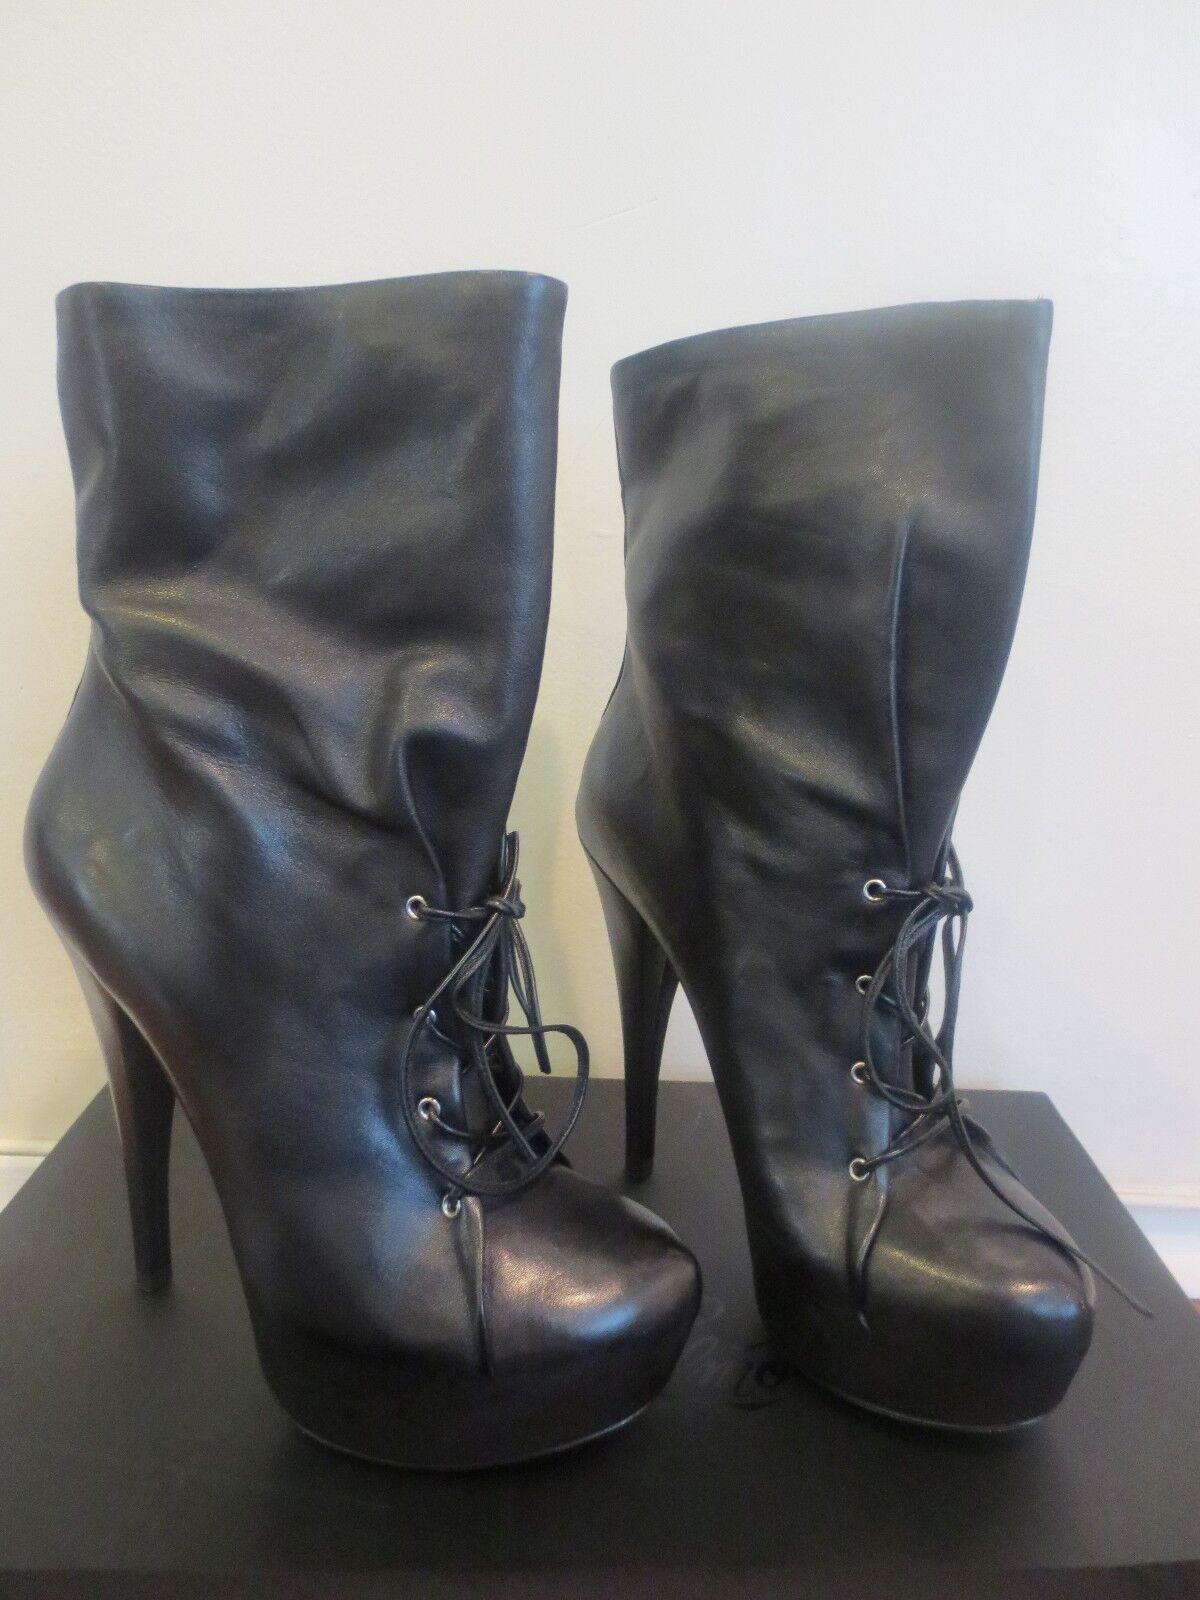 ALEJANDRO INGELMO Black Mia Boot Size 39.5EUR /9.5 US MSRP $795